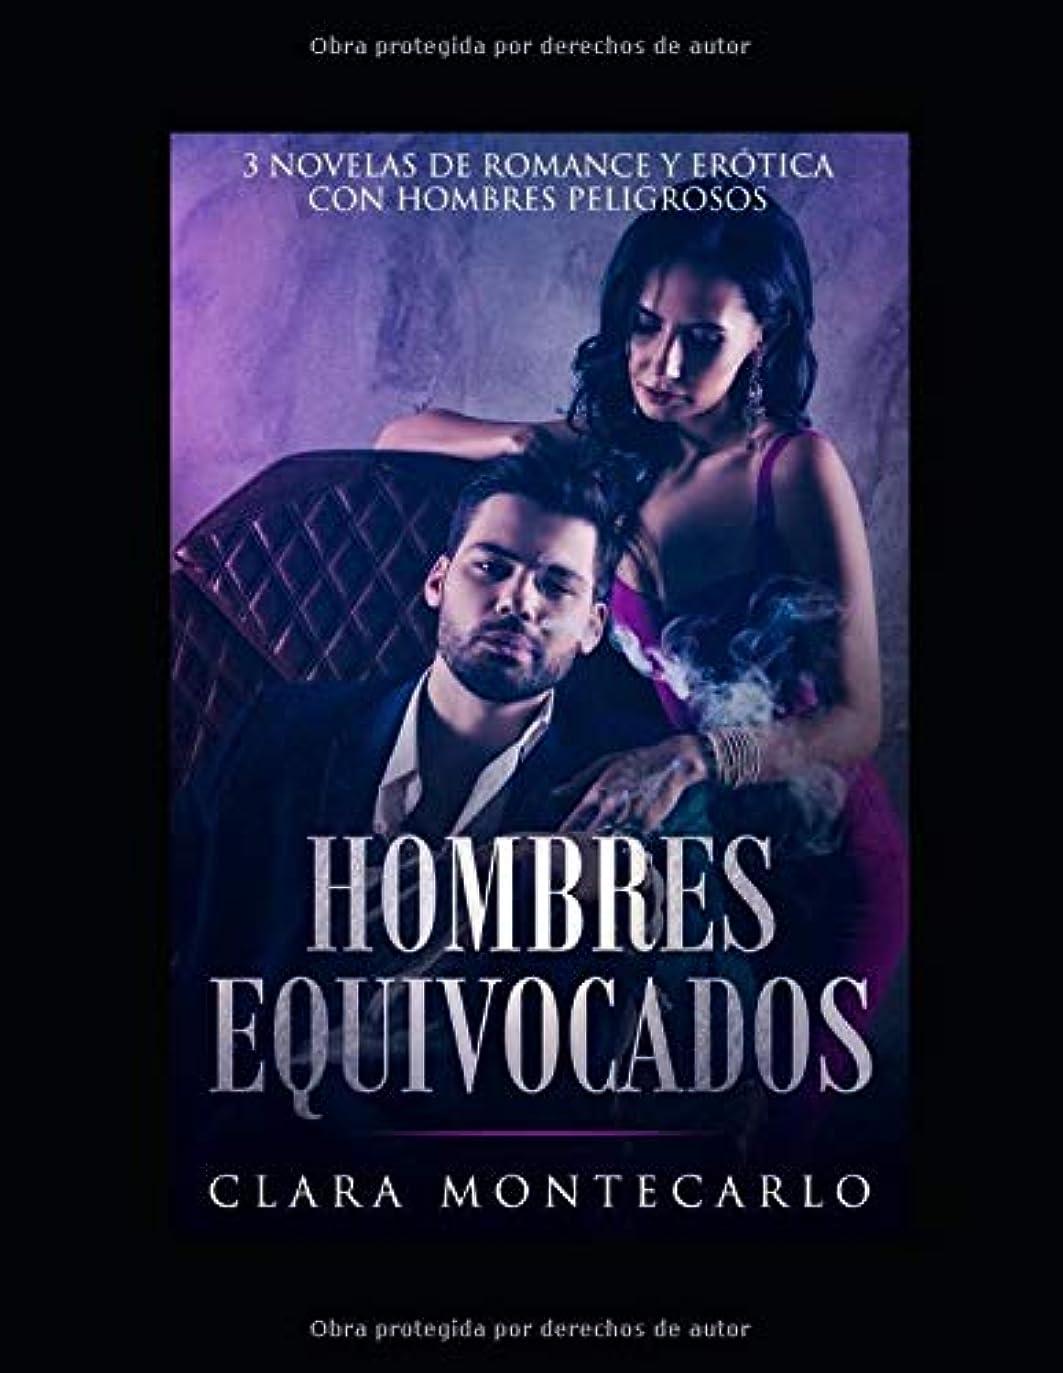 ヒューム人質瞑想Hombres Equivocados: 3 Novelas de Romance y Erótica con Hombres Peligrosos (Colección de Romance y Erótica)